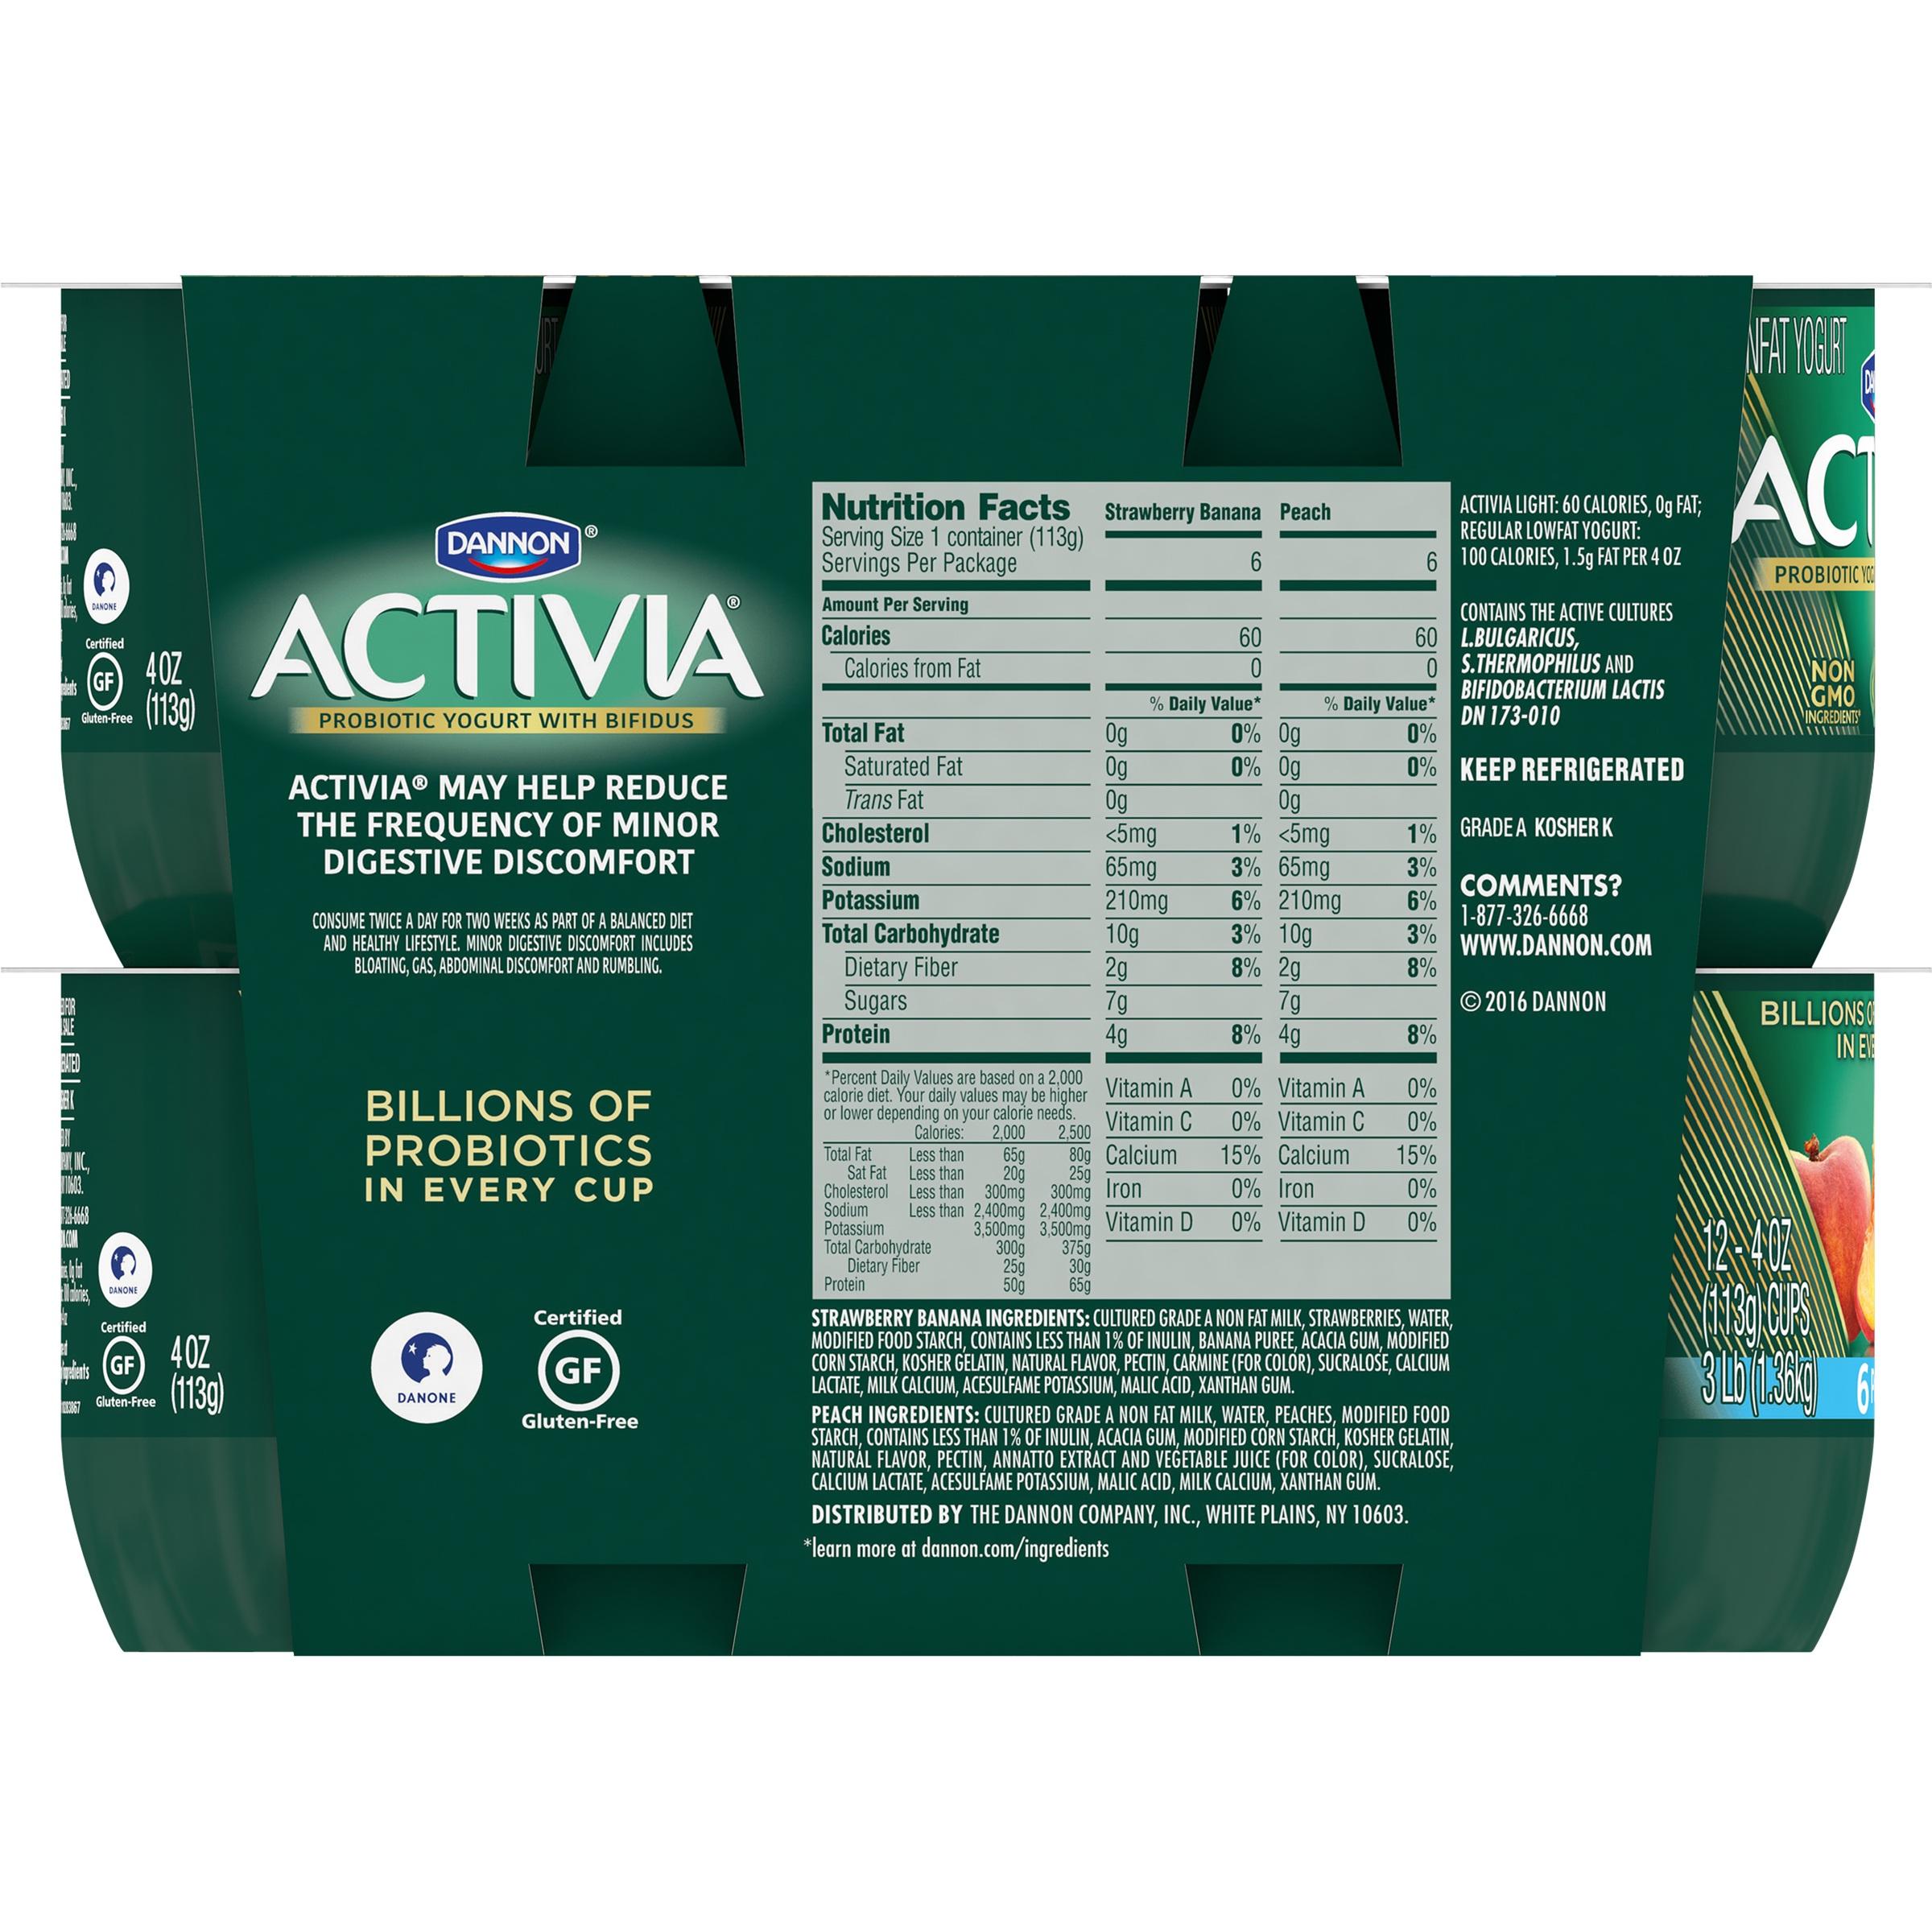 light yogurt nutrition facts | Decoratingspecial.com